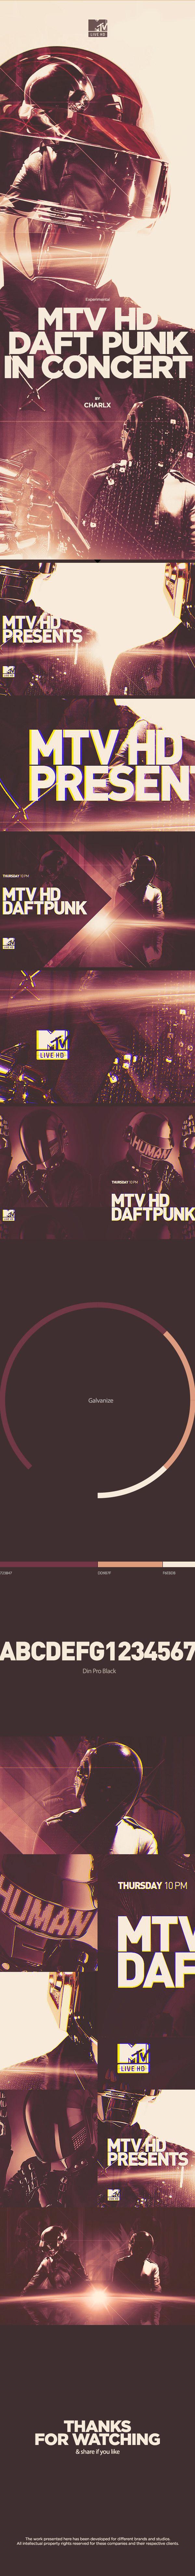 MTV HD   DAFT PUNK